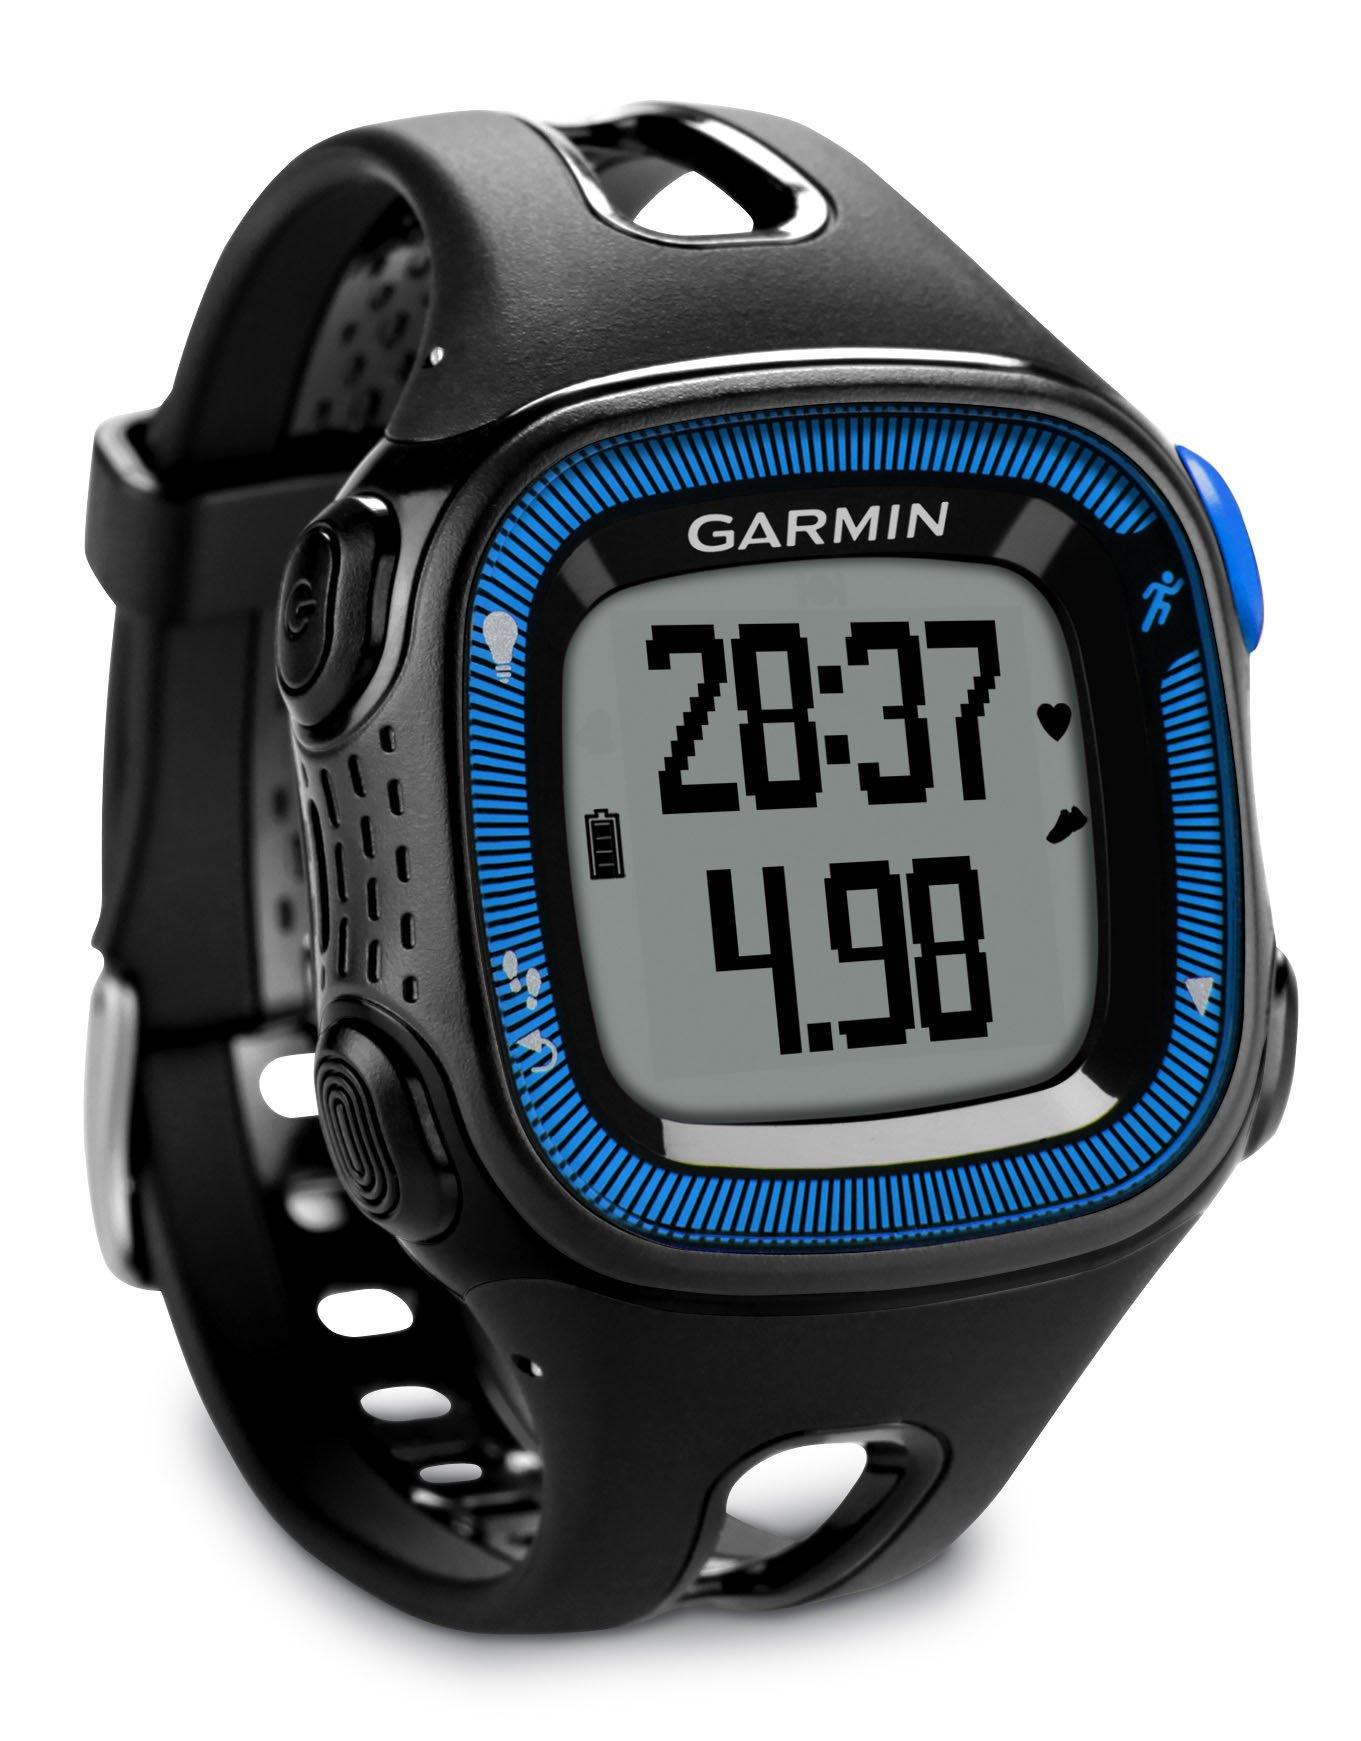 Garmin Forerunner 15 GPS Running con Funzione Contapassi, Misura Large, Nero/Blu product image